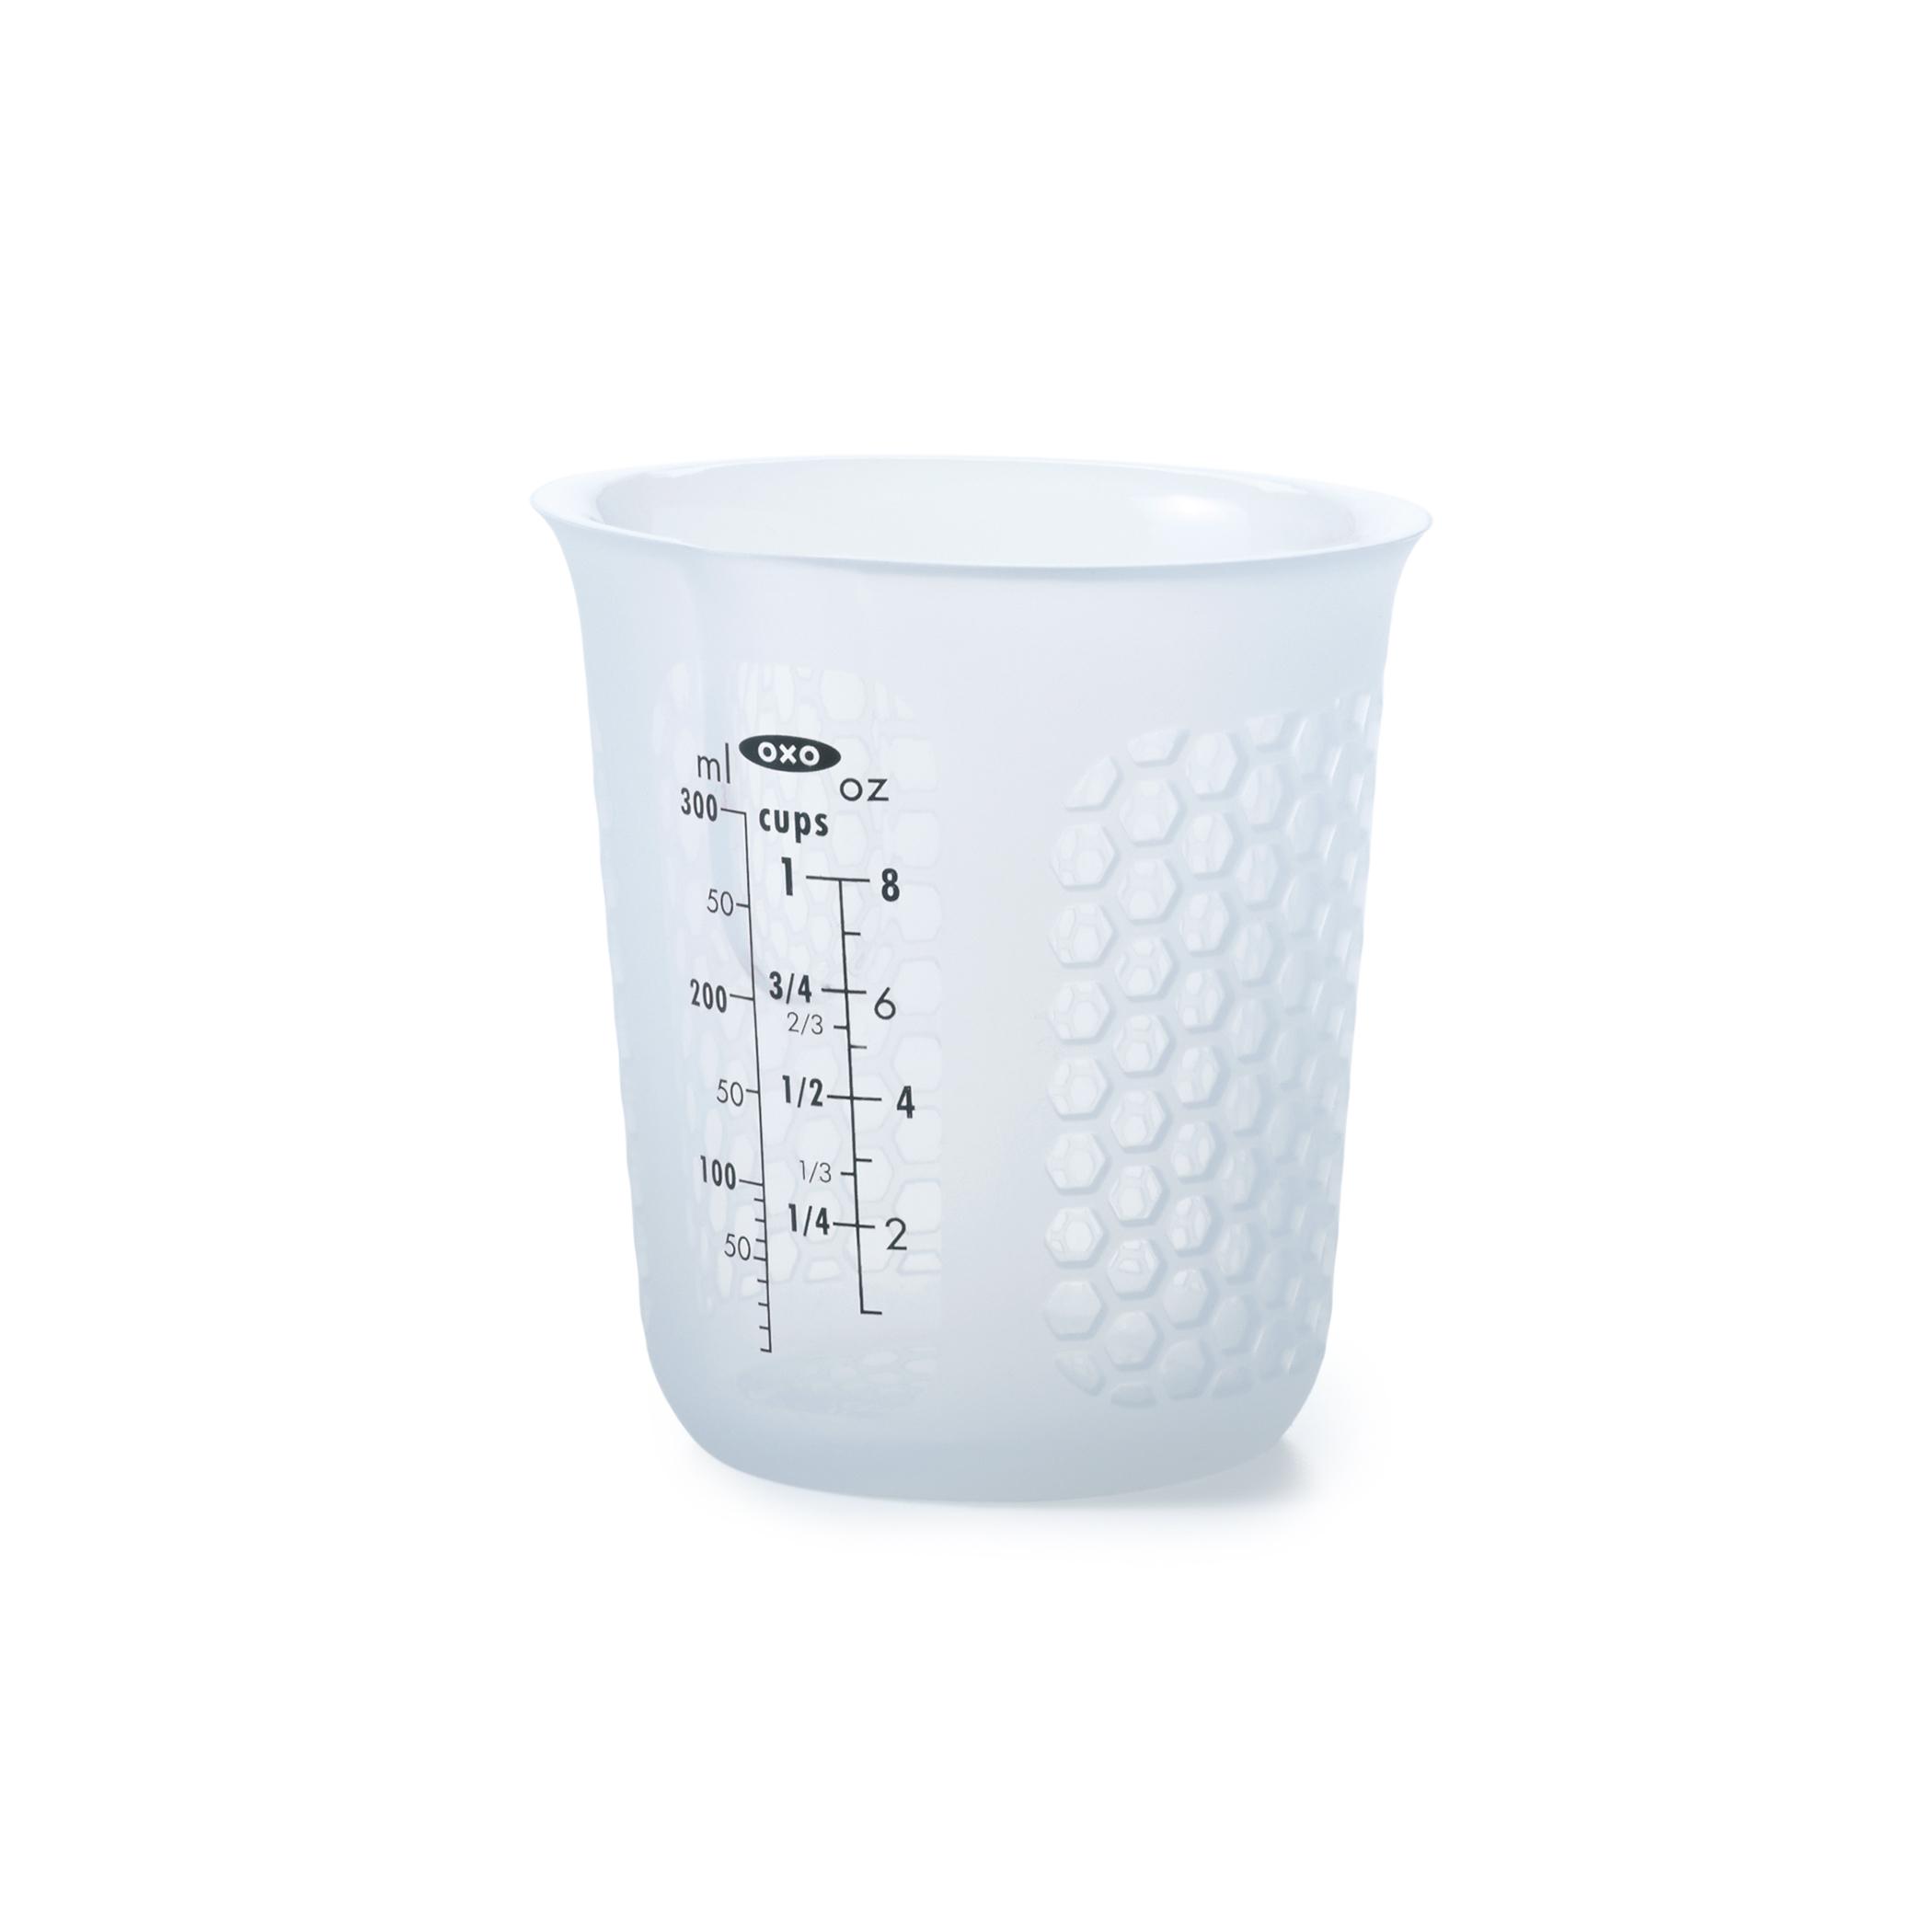 OXO 矽膠軟質量杯 0.25L 010310SET1